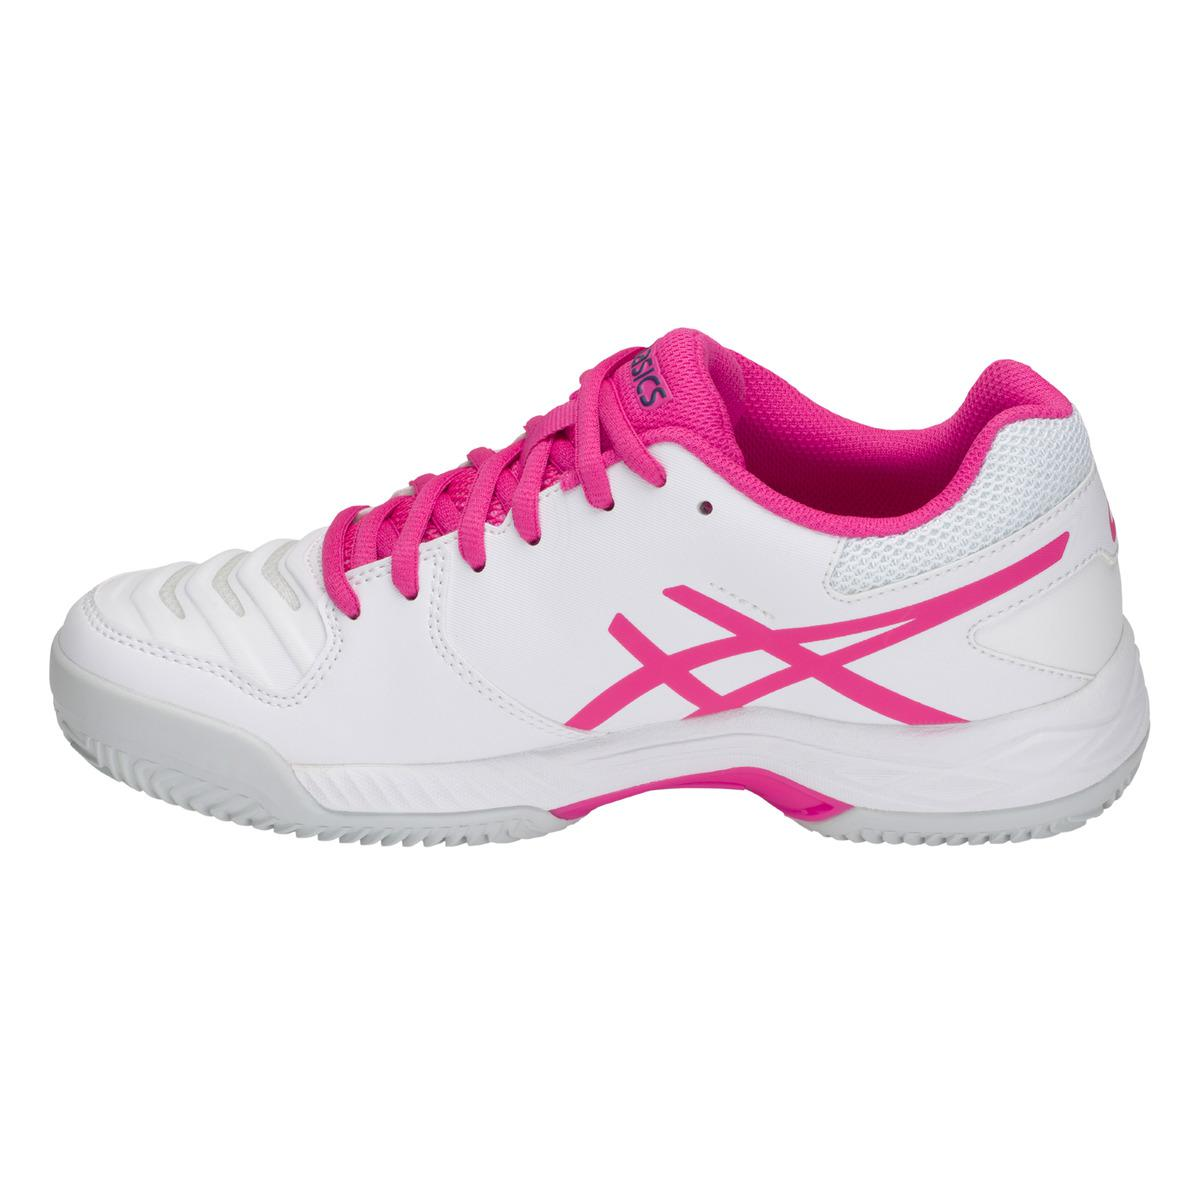 1f6e9deb9e550 Asics Gel-game 6 Tennis Shoe in Pink - Lyst